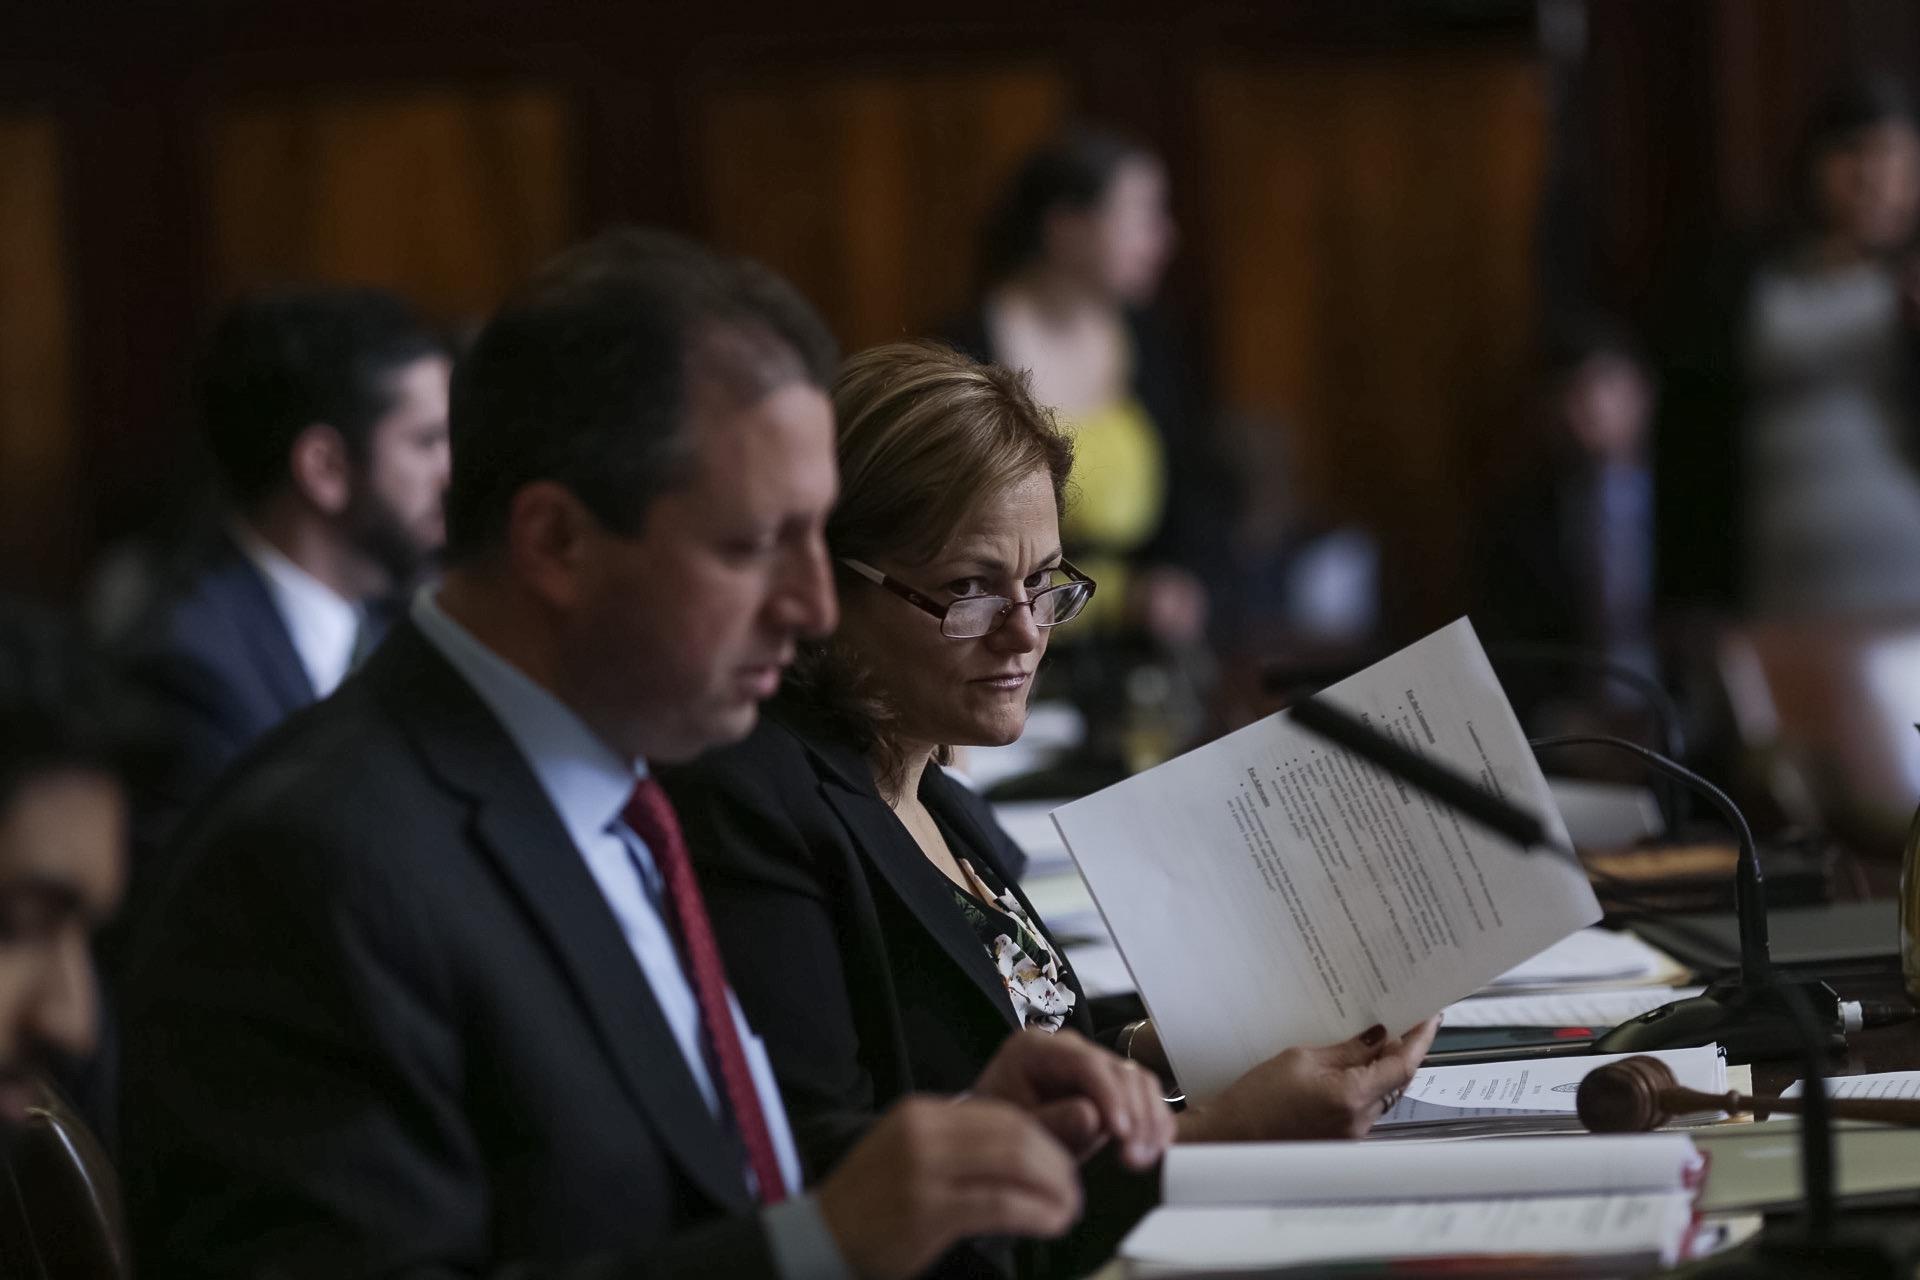 Councilman Brad Lander and Council Speaker Melissa Mark-Viverito at today's hearing. (Photo: William Alatriste/New York City Council)